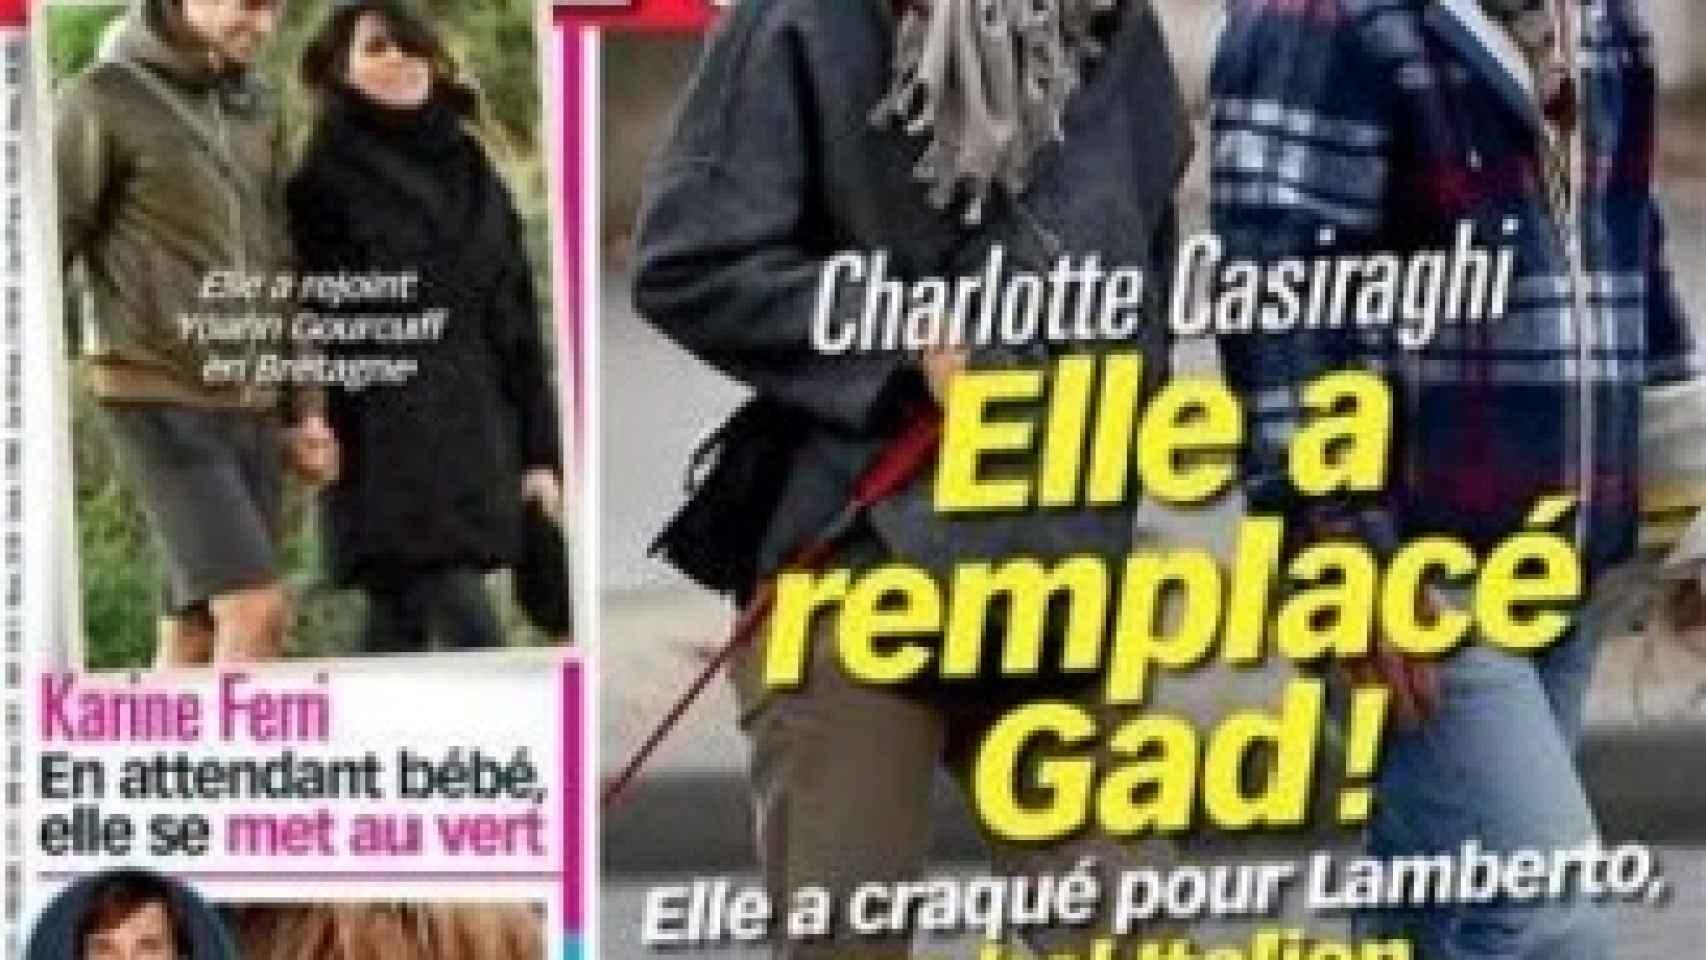 Carlota Casiraghi junto a Lamberto Sanfelice en la portada de Voici